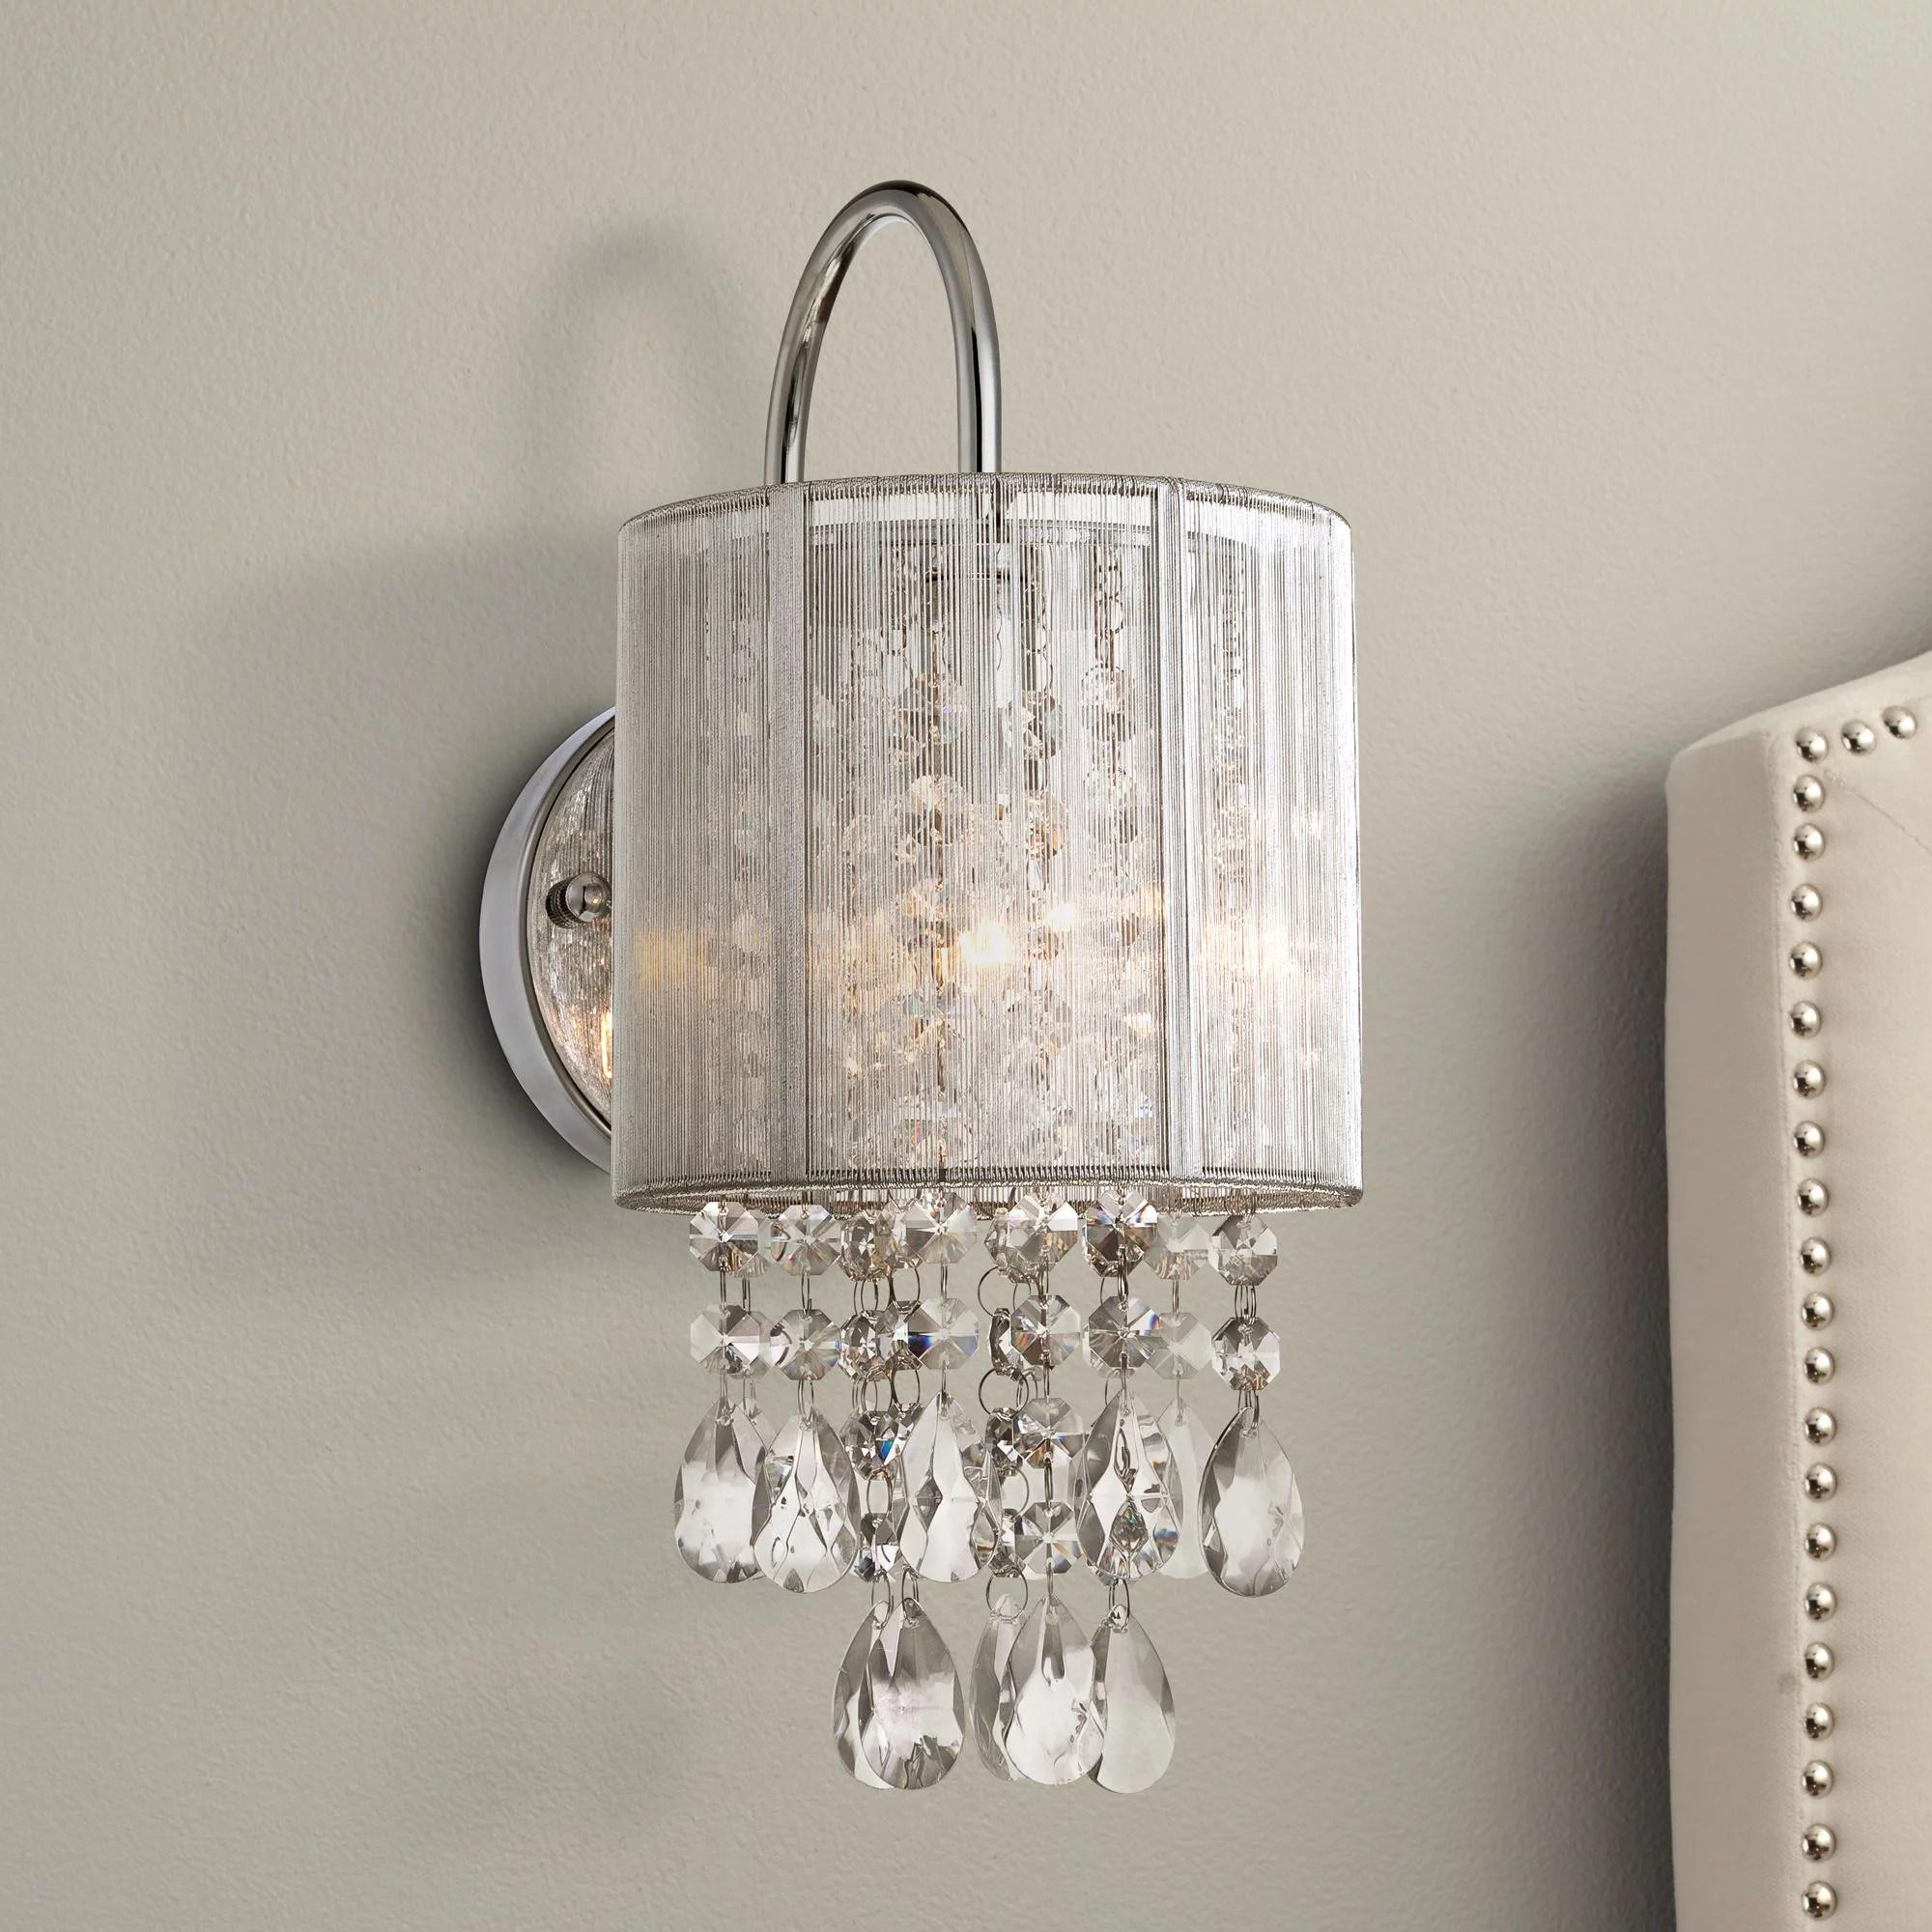 "Possini Euro Design Modern Wall Light Chrome 12"" Crystal ... on Crystal Bathroom Sconces id=90115"